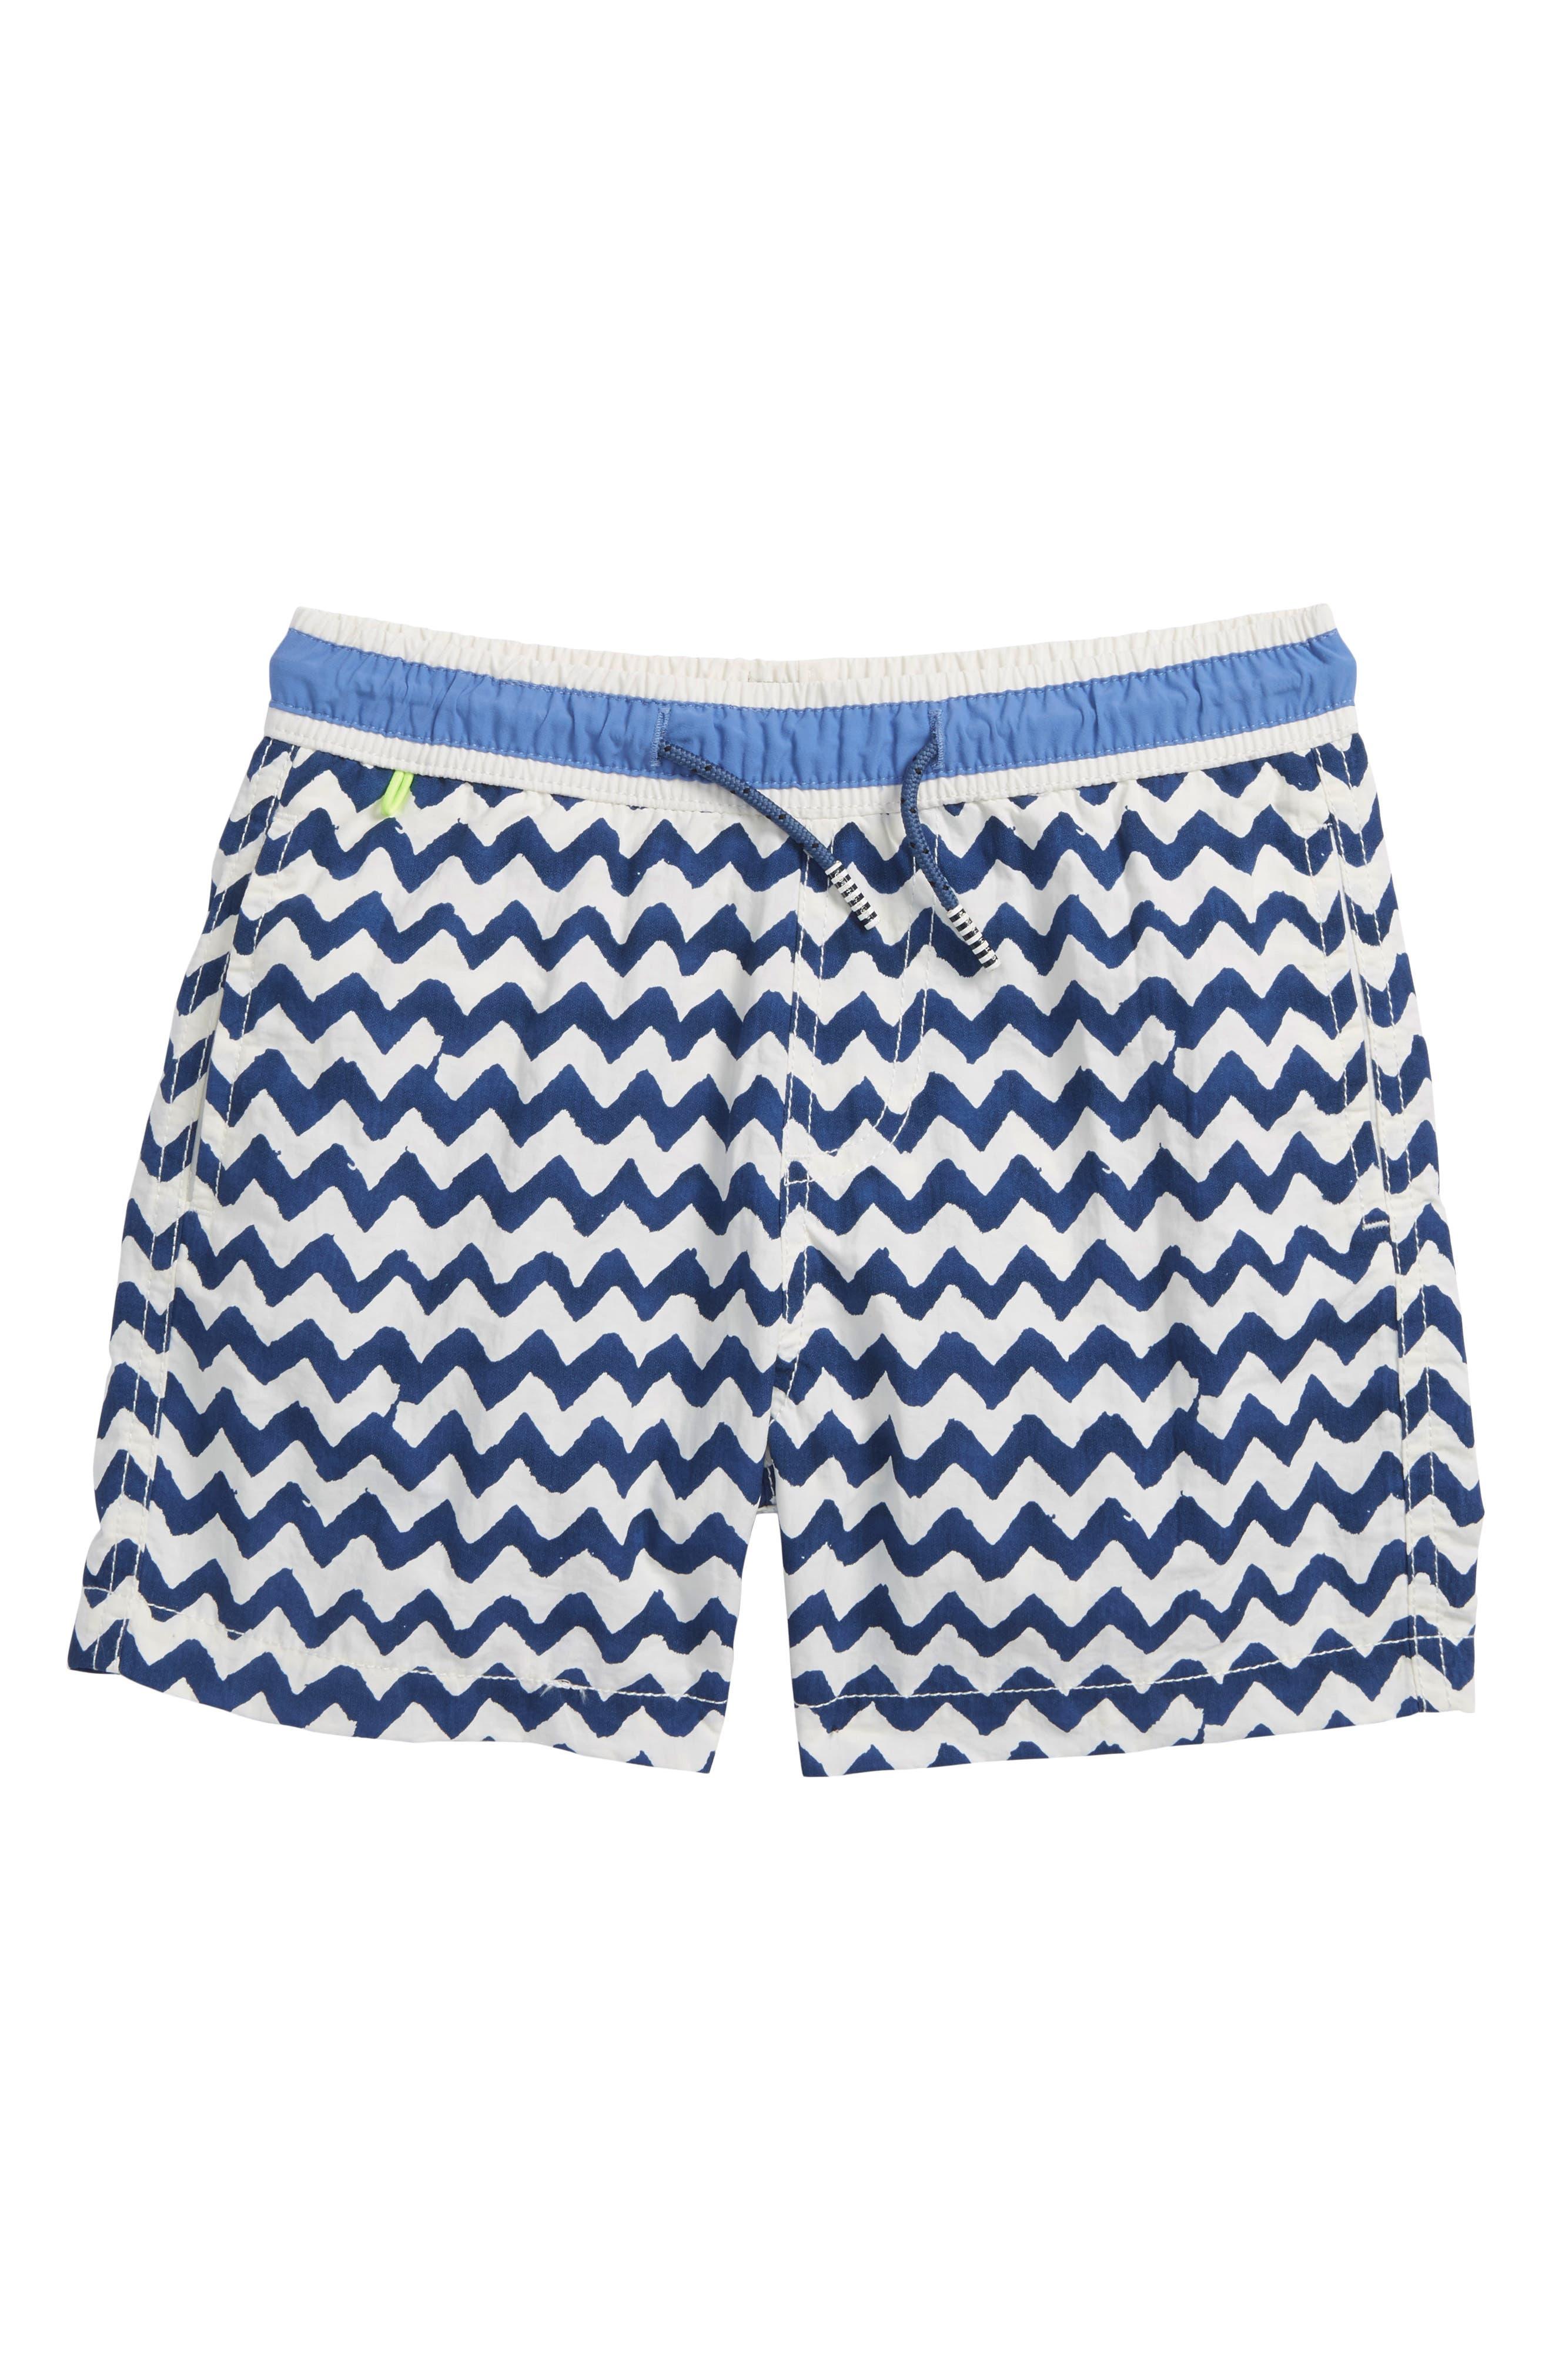 Allover Print Swim Trunks,                         Main,                         color, Blue